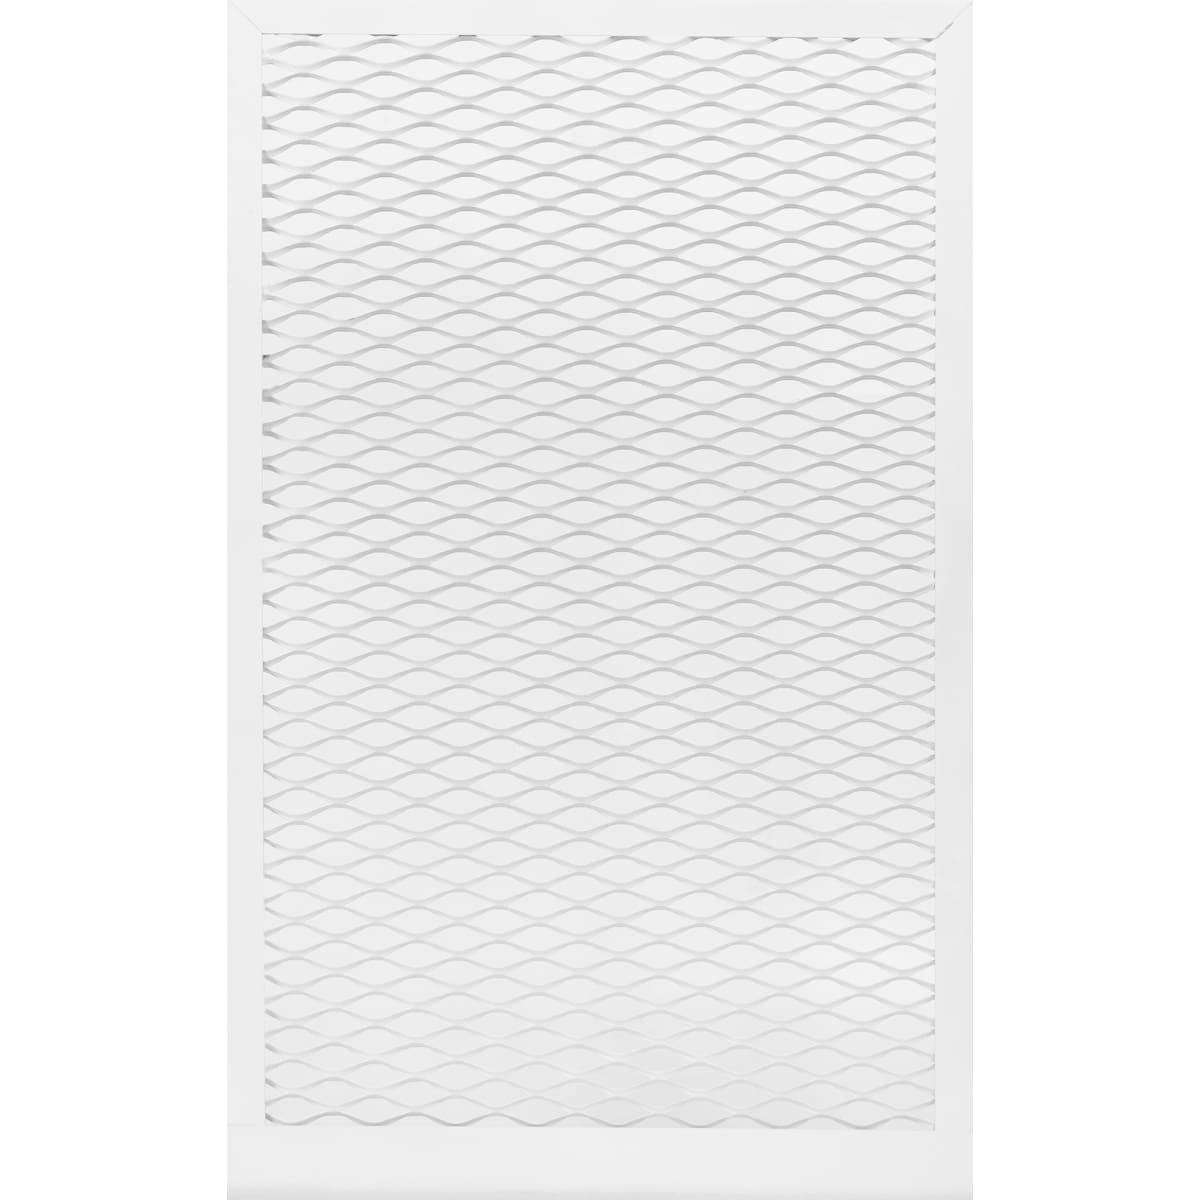 Декоративная панель 5 секций 520x620 мм